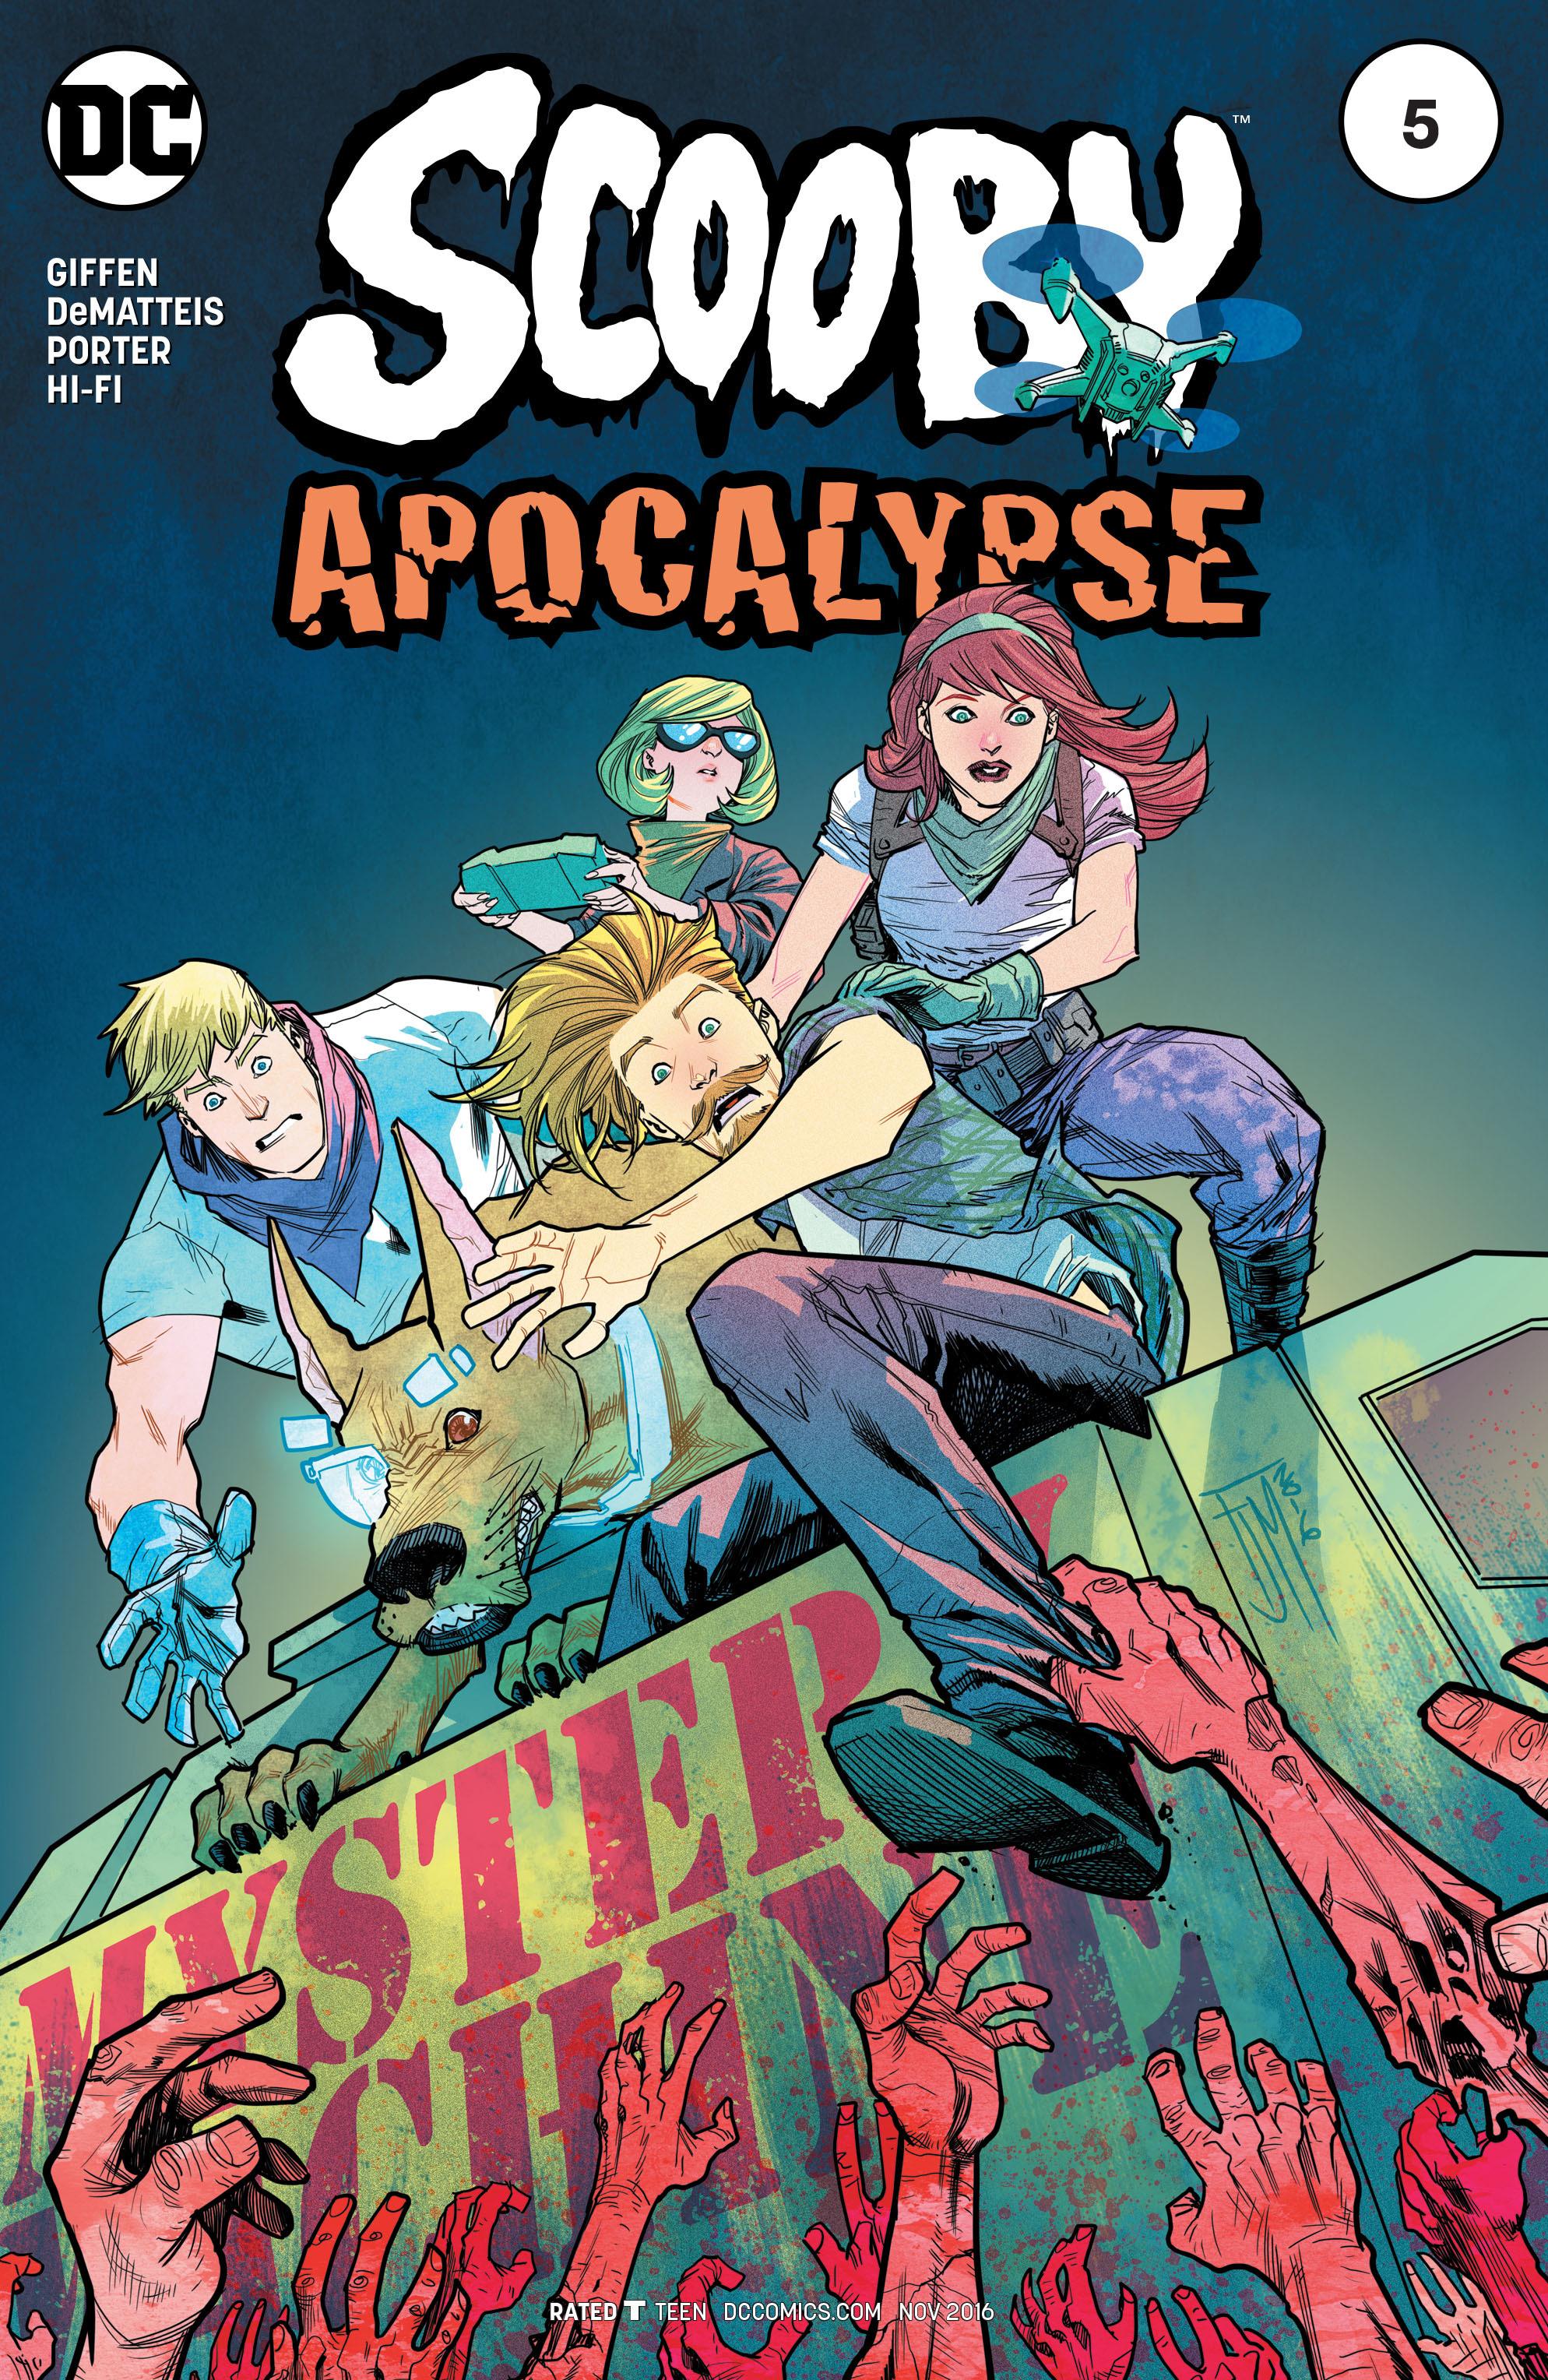 Read online Scooby Apocalypse comic -  Issue #5 - 3